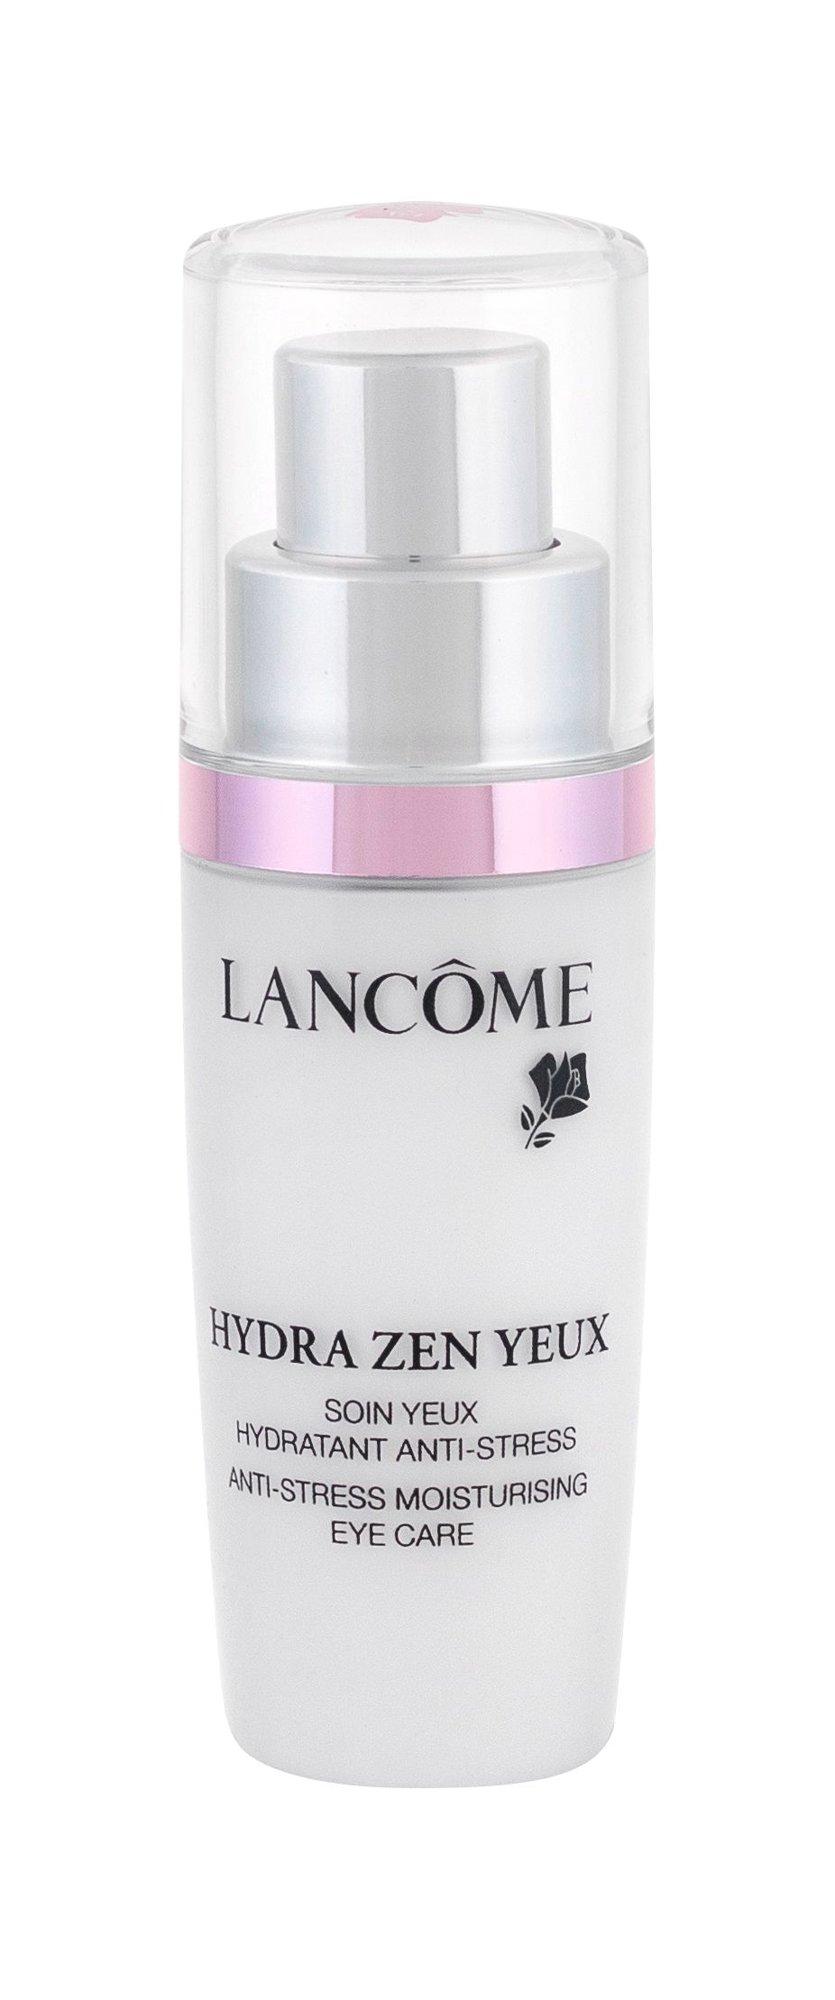 Veido kremas Lancôme Hydra Zen